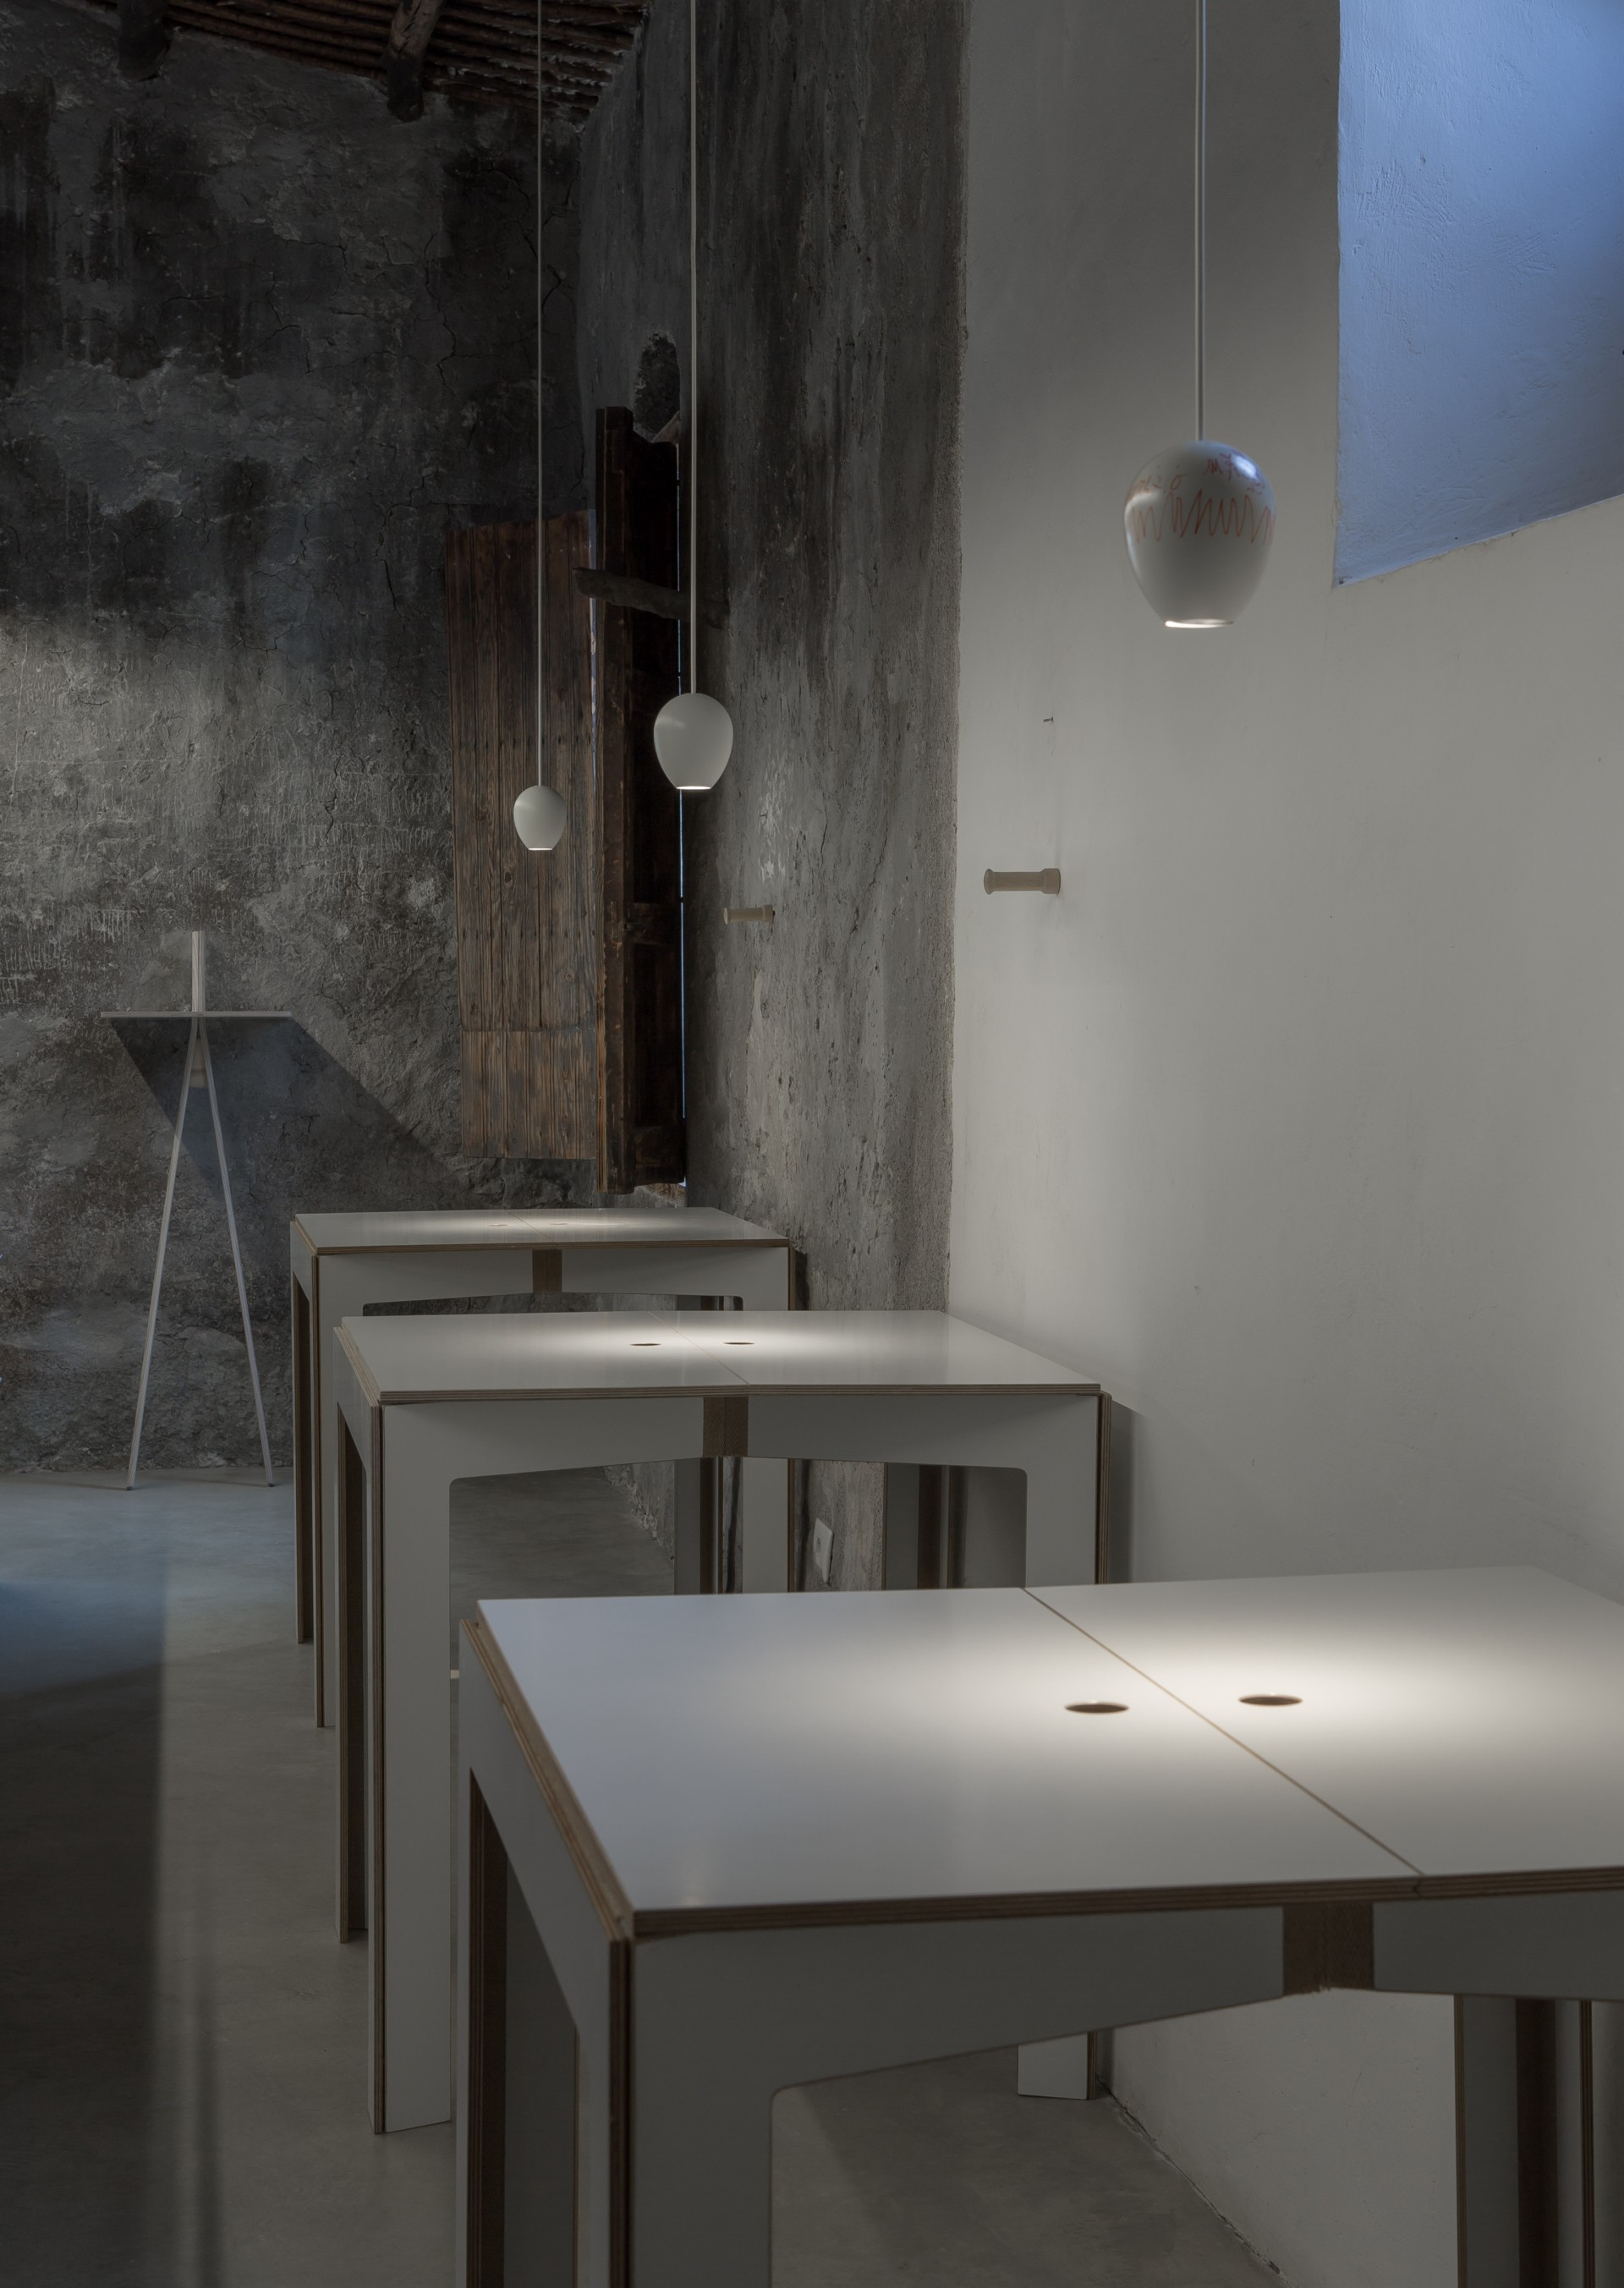 Le luci di Davide Groppi per Hotel N\'Orma | Floornature